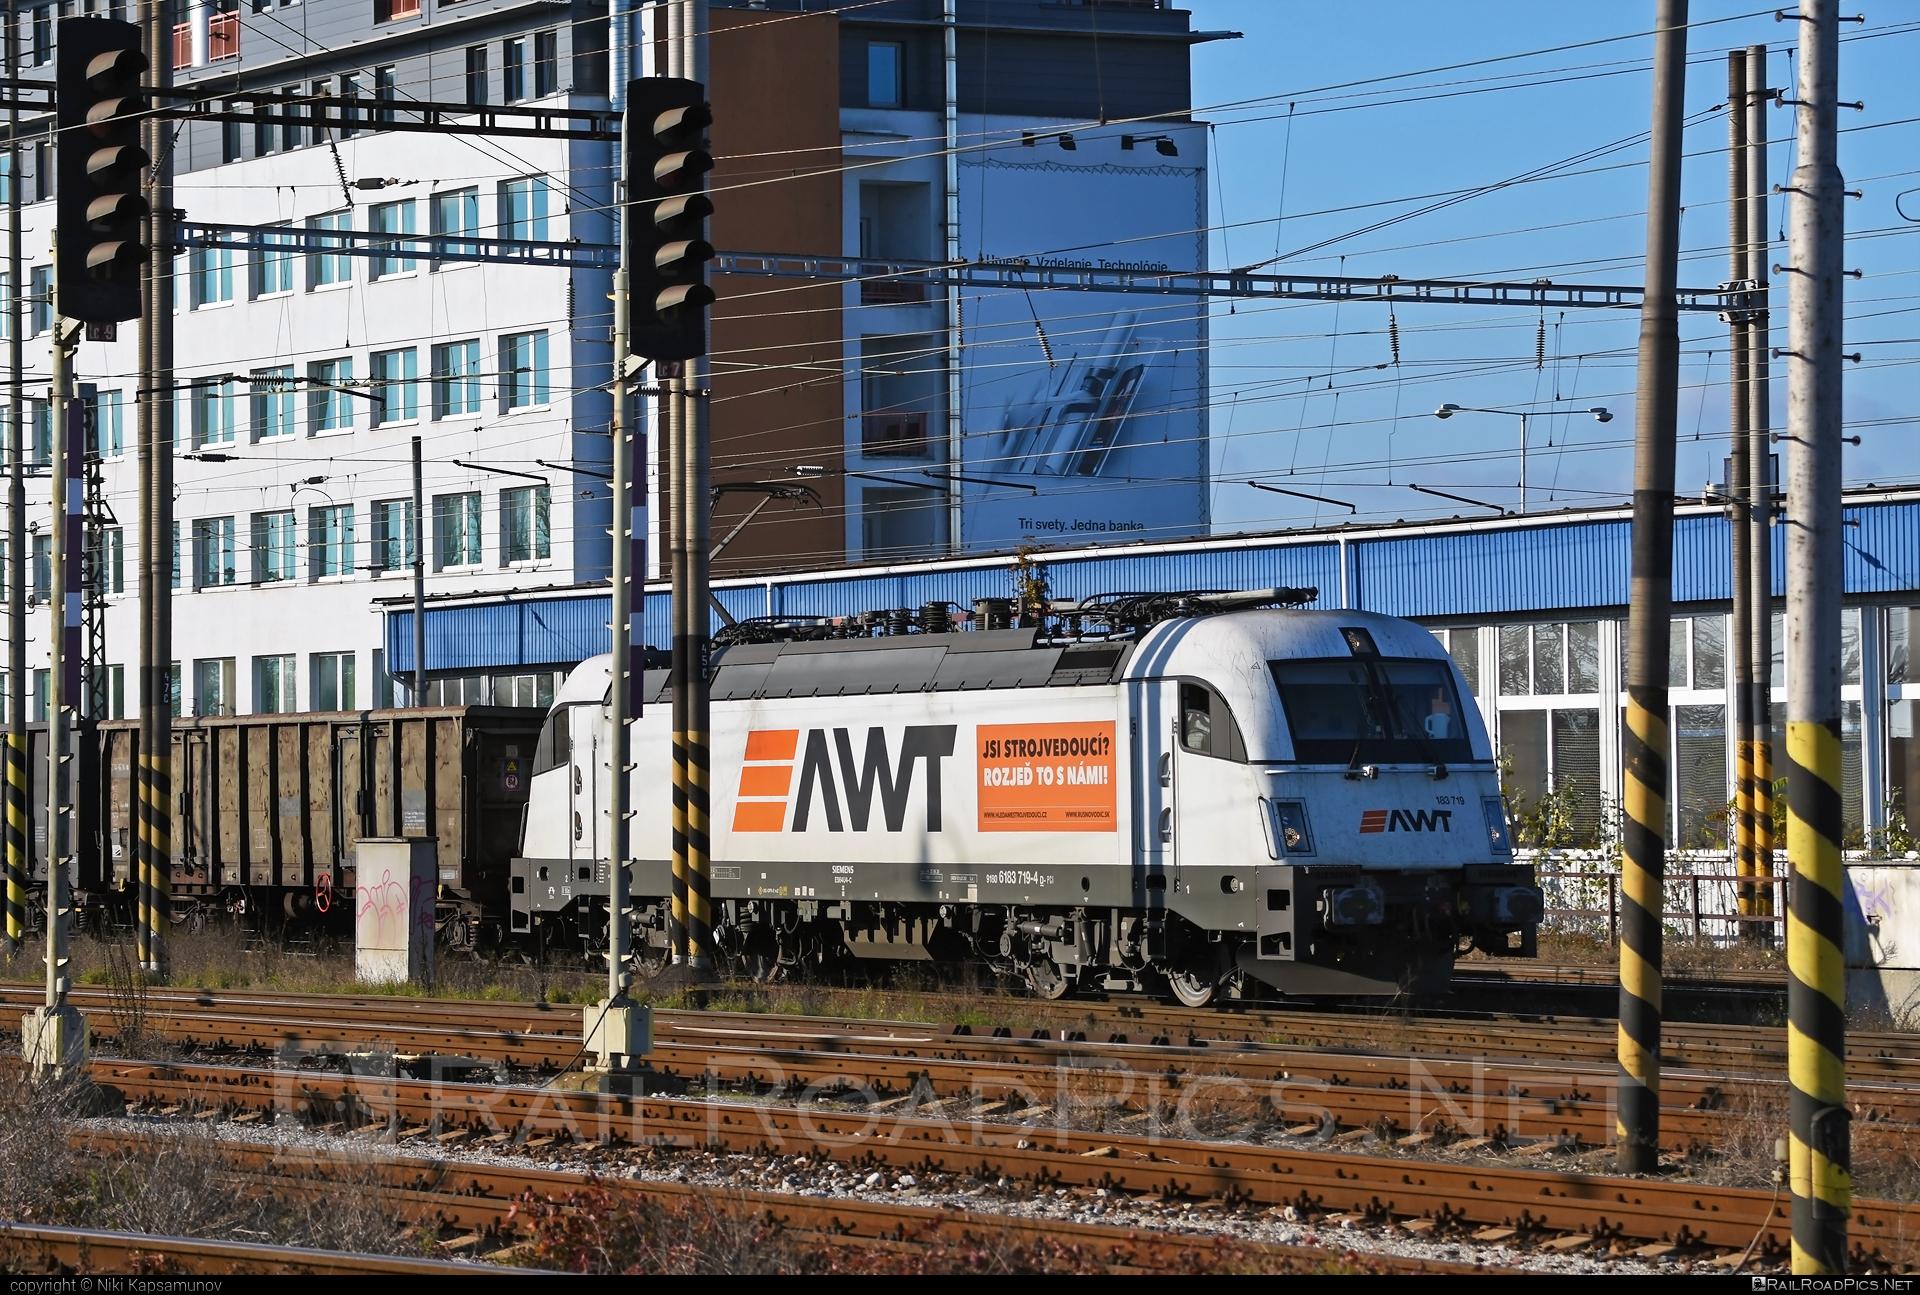 Siemens ES 64 U4 - 183 719 operated by PKP CARGO INTERNATIONAL a.s. #awt #es64 #es64u #es64u4 #eurosprinter #pkpcargo #pkpcargointernational #pkpcargointernationalas #siemens #siemenses64 #siemenses64u #siemenses64u4 #siemenstaurus #taurus #tauruslocomotive